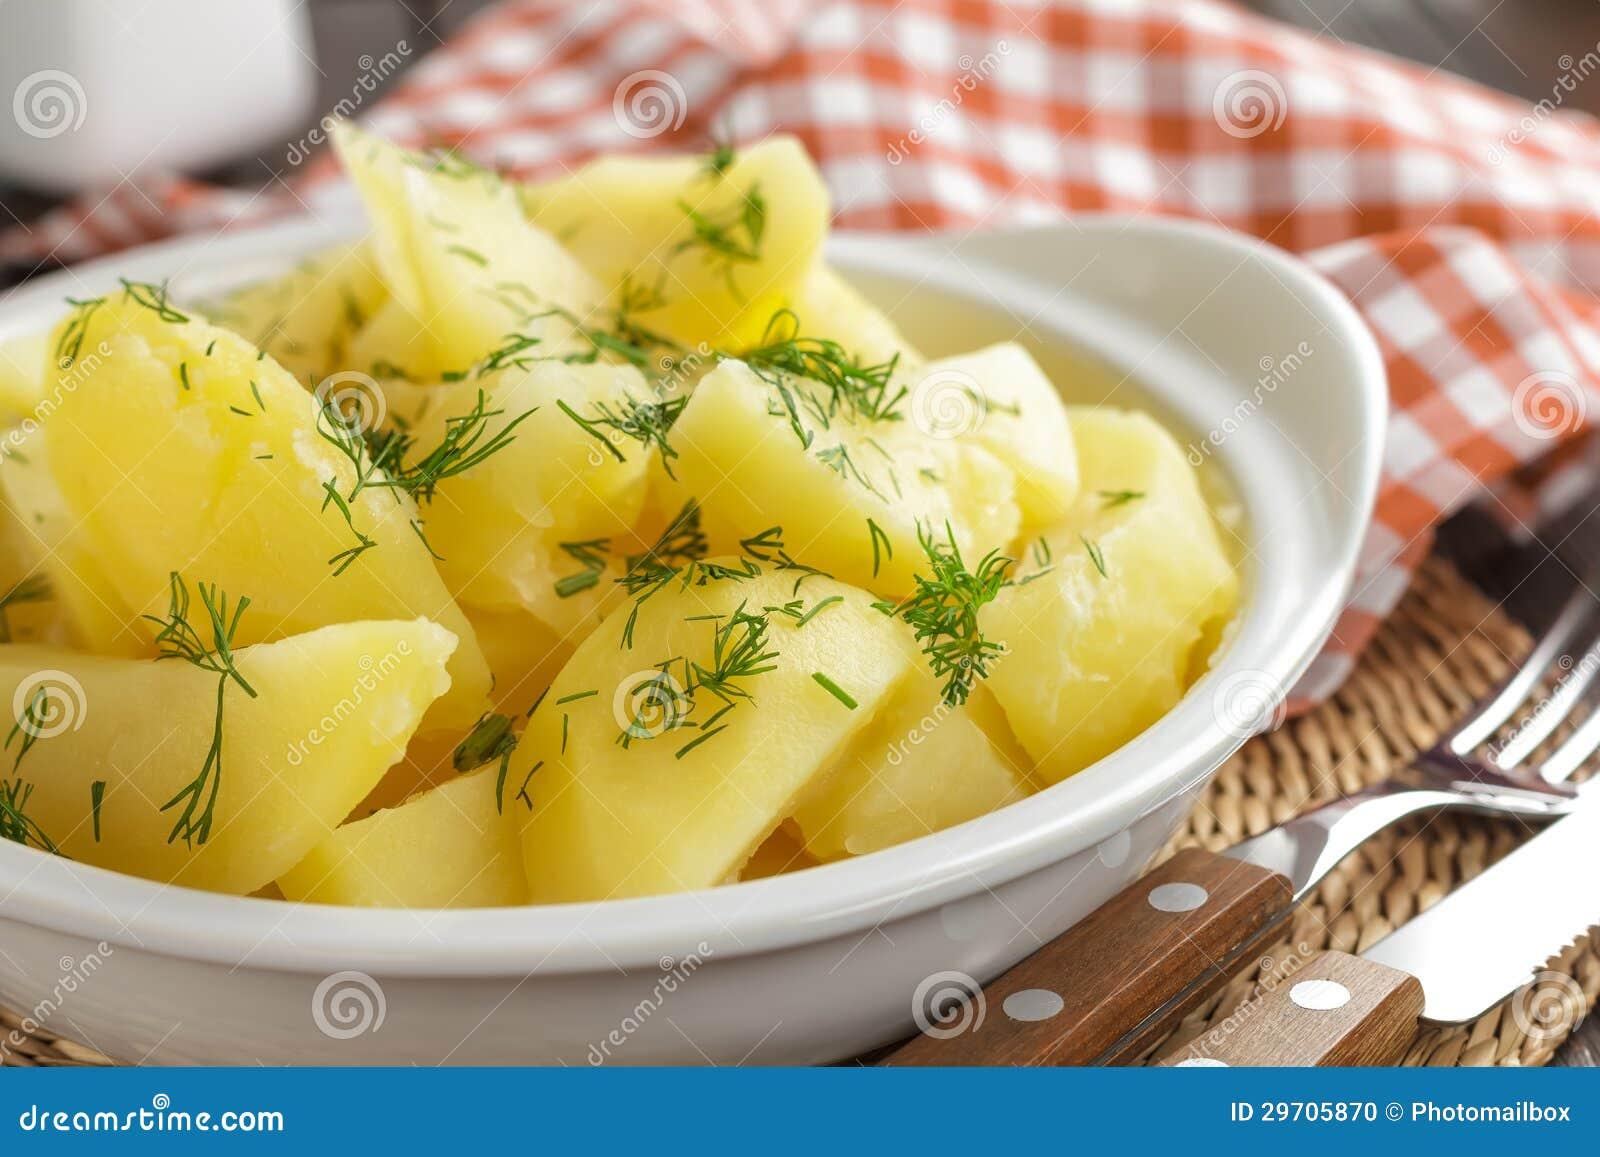 Boiled Potatoes Stock Photo - Image: 29705870